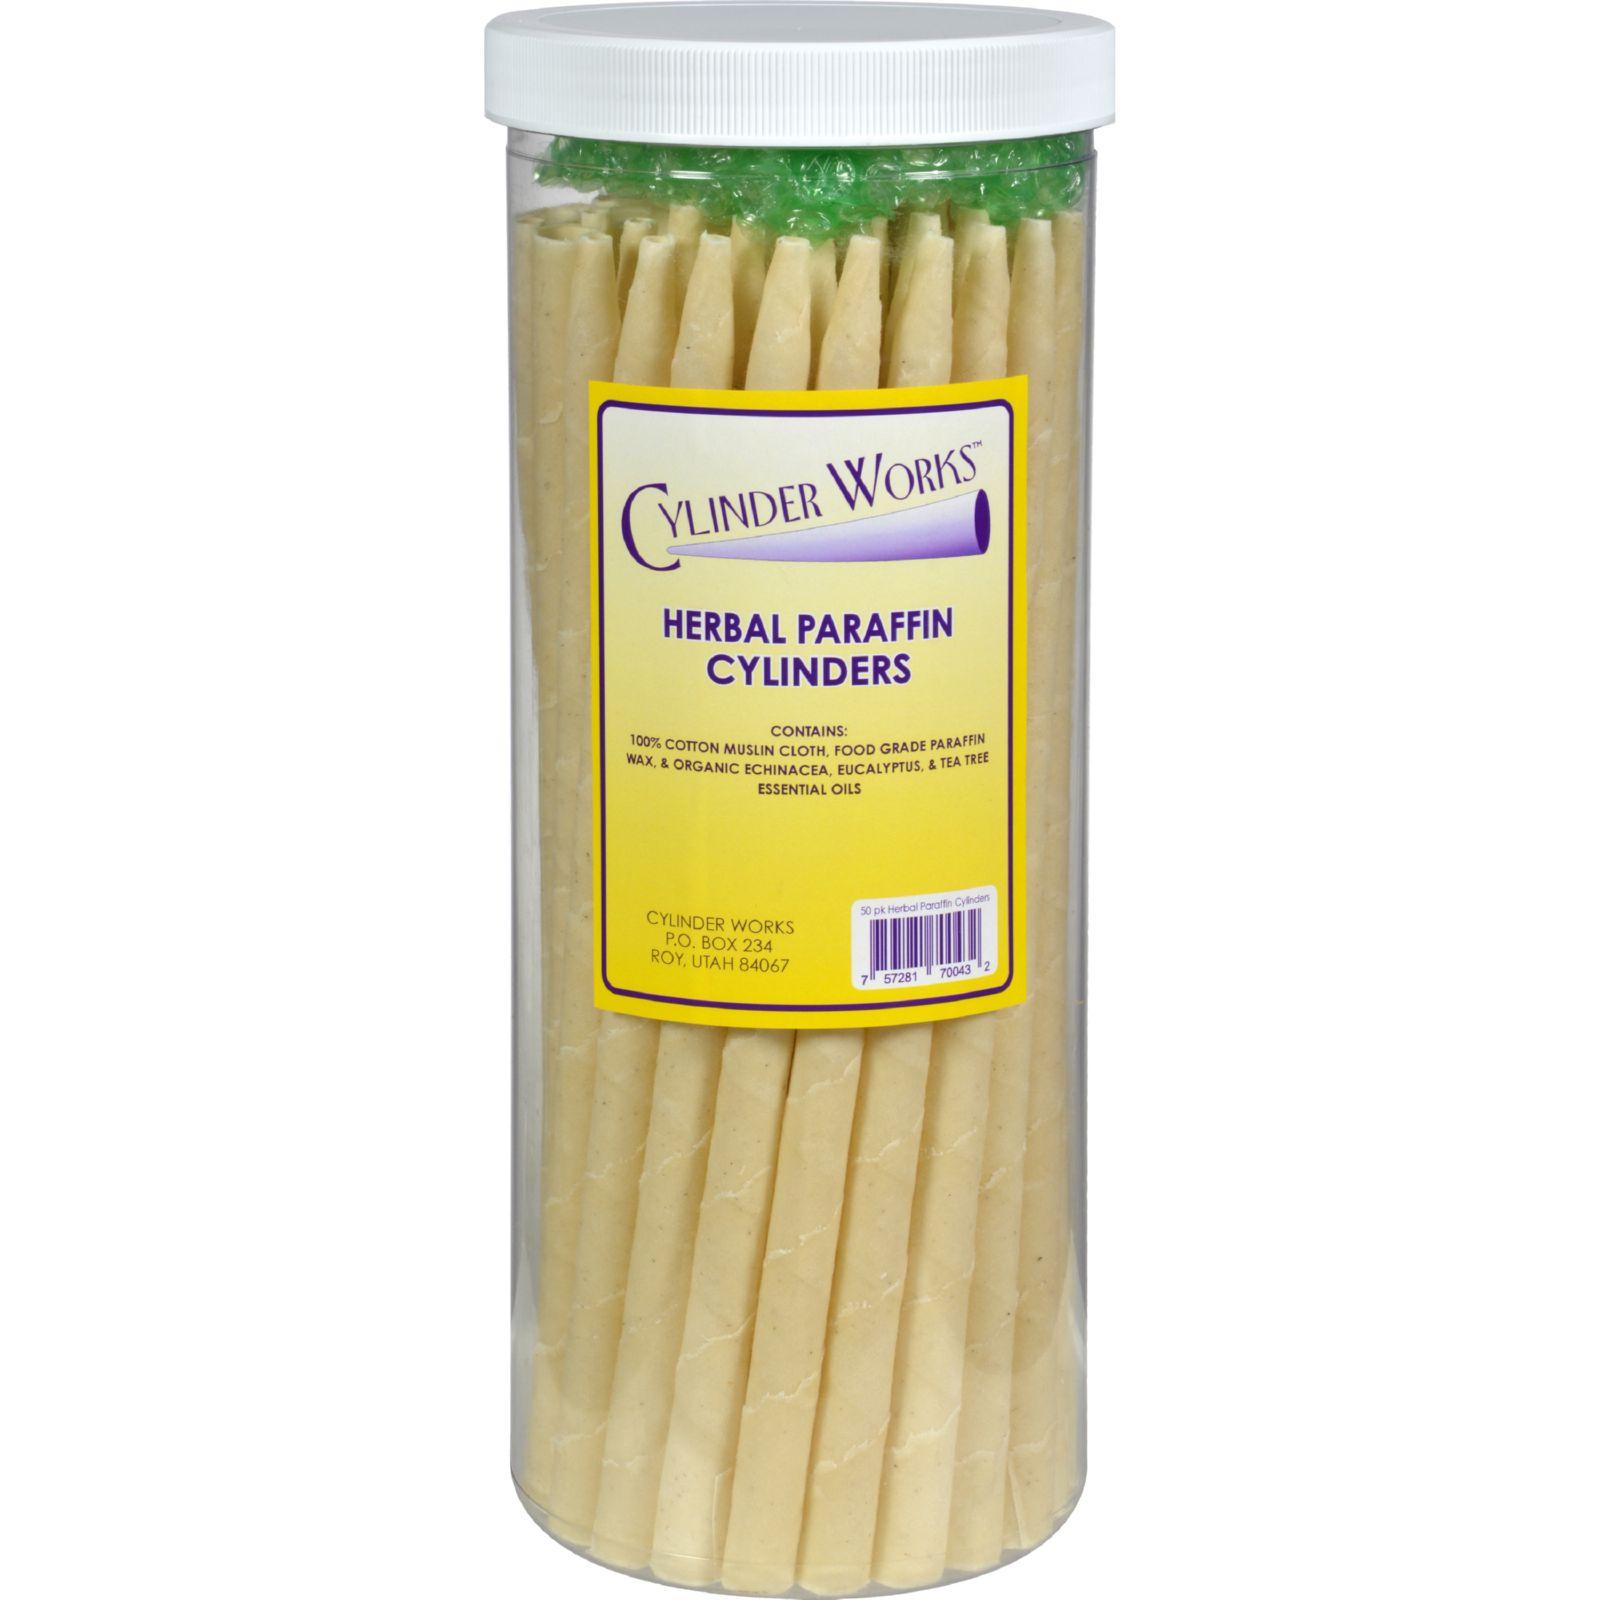 Cylinder Works Herbal Paraffin Cylinders